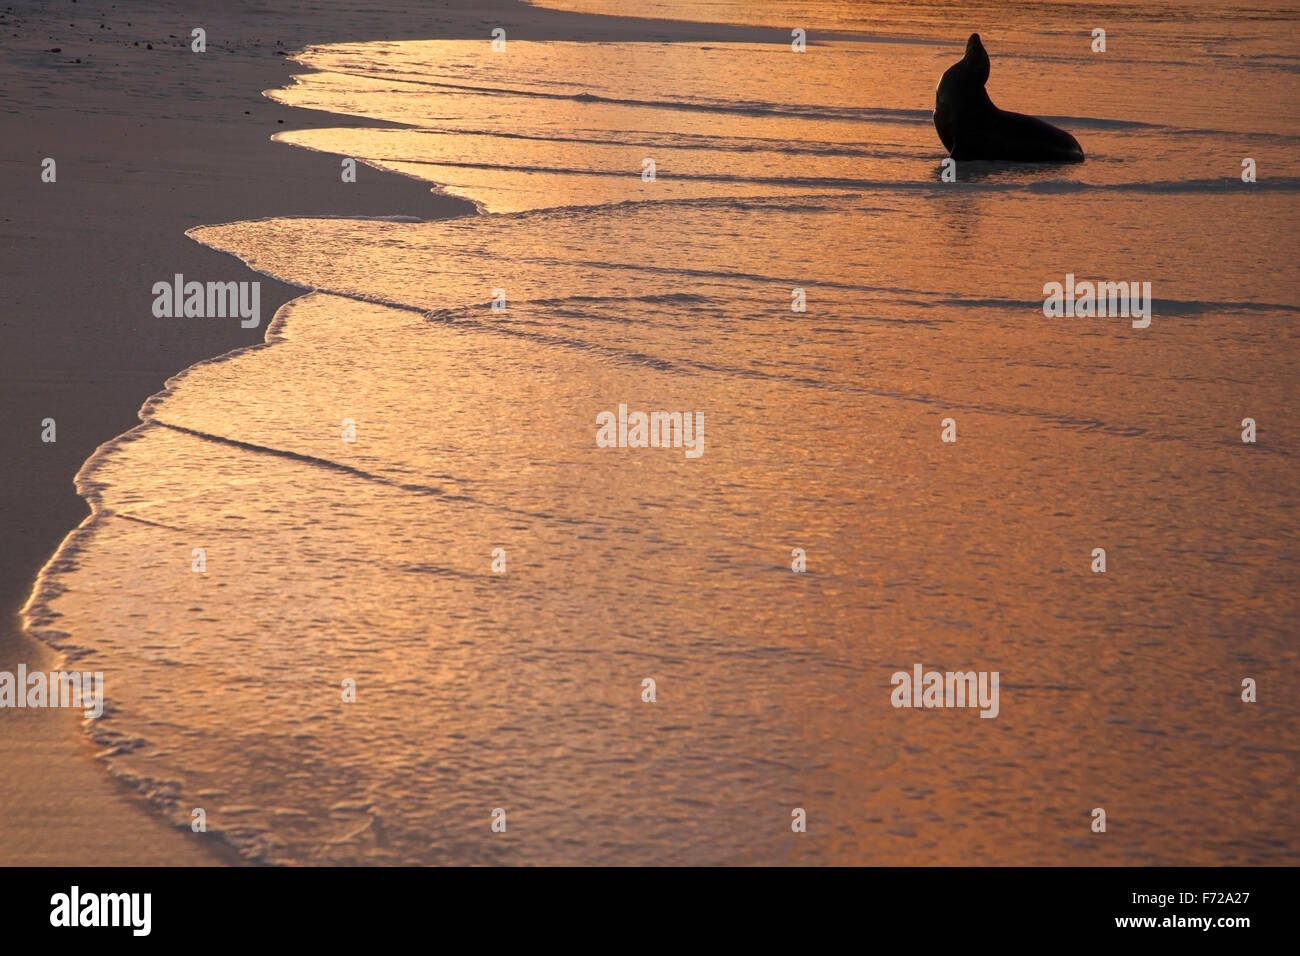 Galapagos Sea Lion (Zalophus wollebaeki) on the beach at twilight - Stock Image